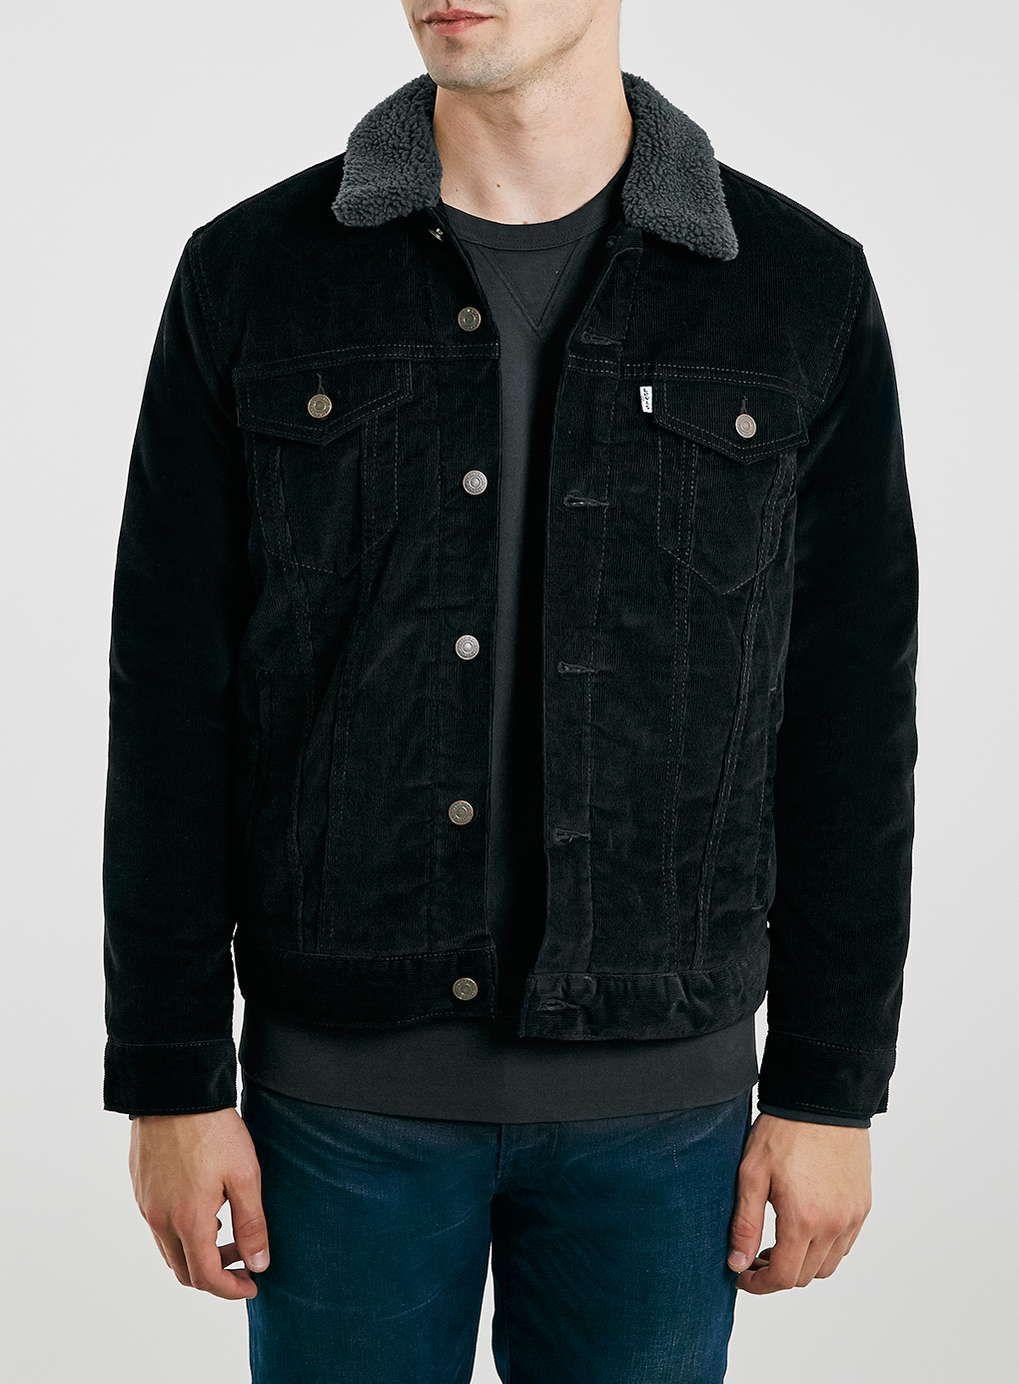 1d41f7b94c4 Levi s black needlepoint corduroy jacket with dark grey borg lining. Item  code  66L30KBLK